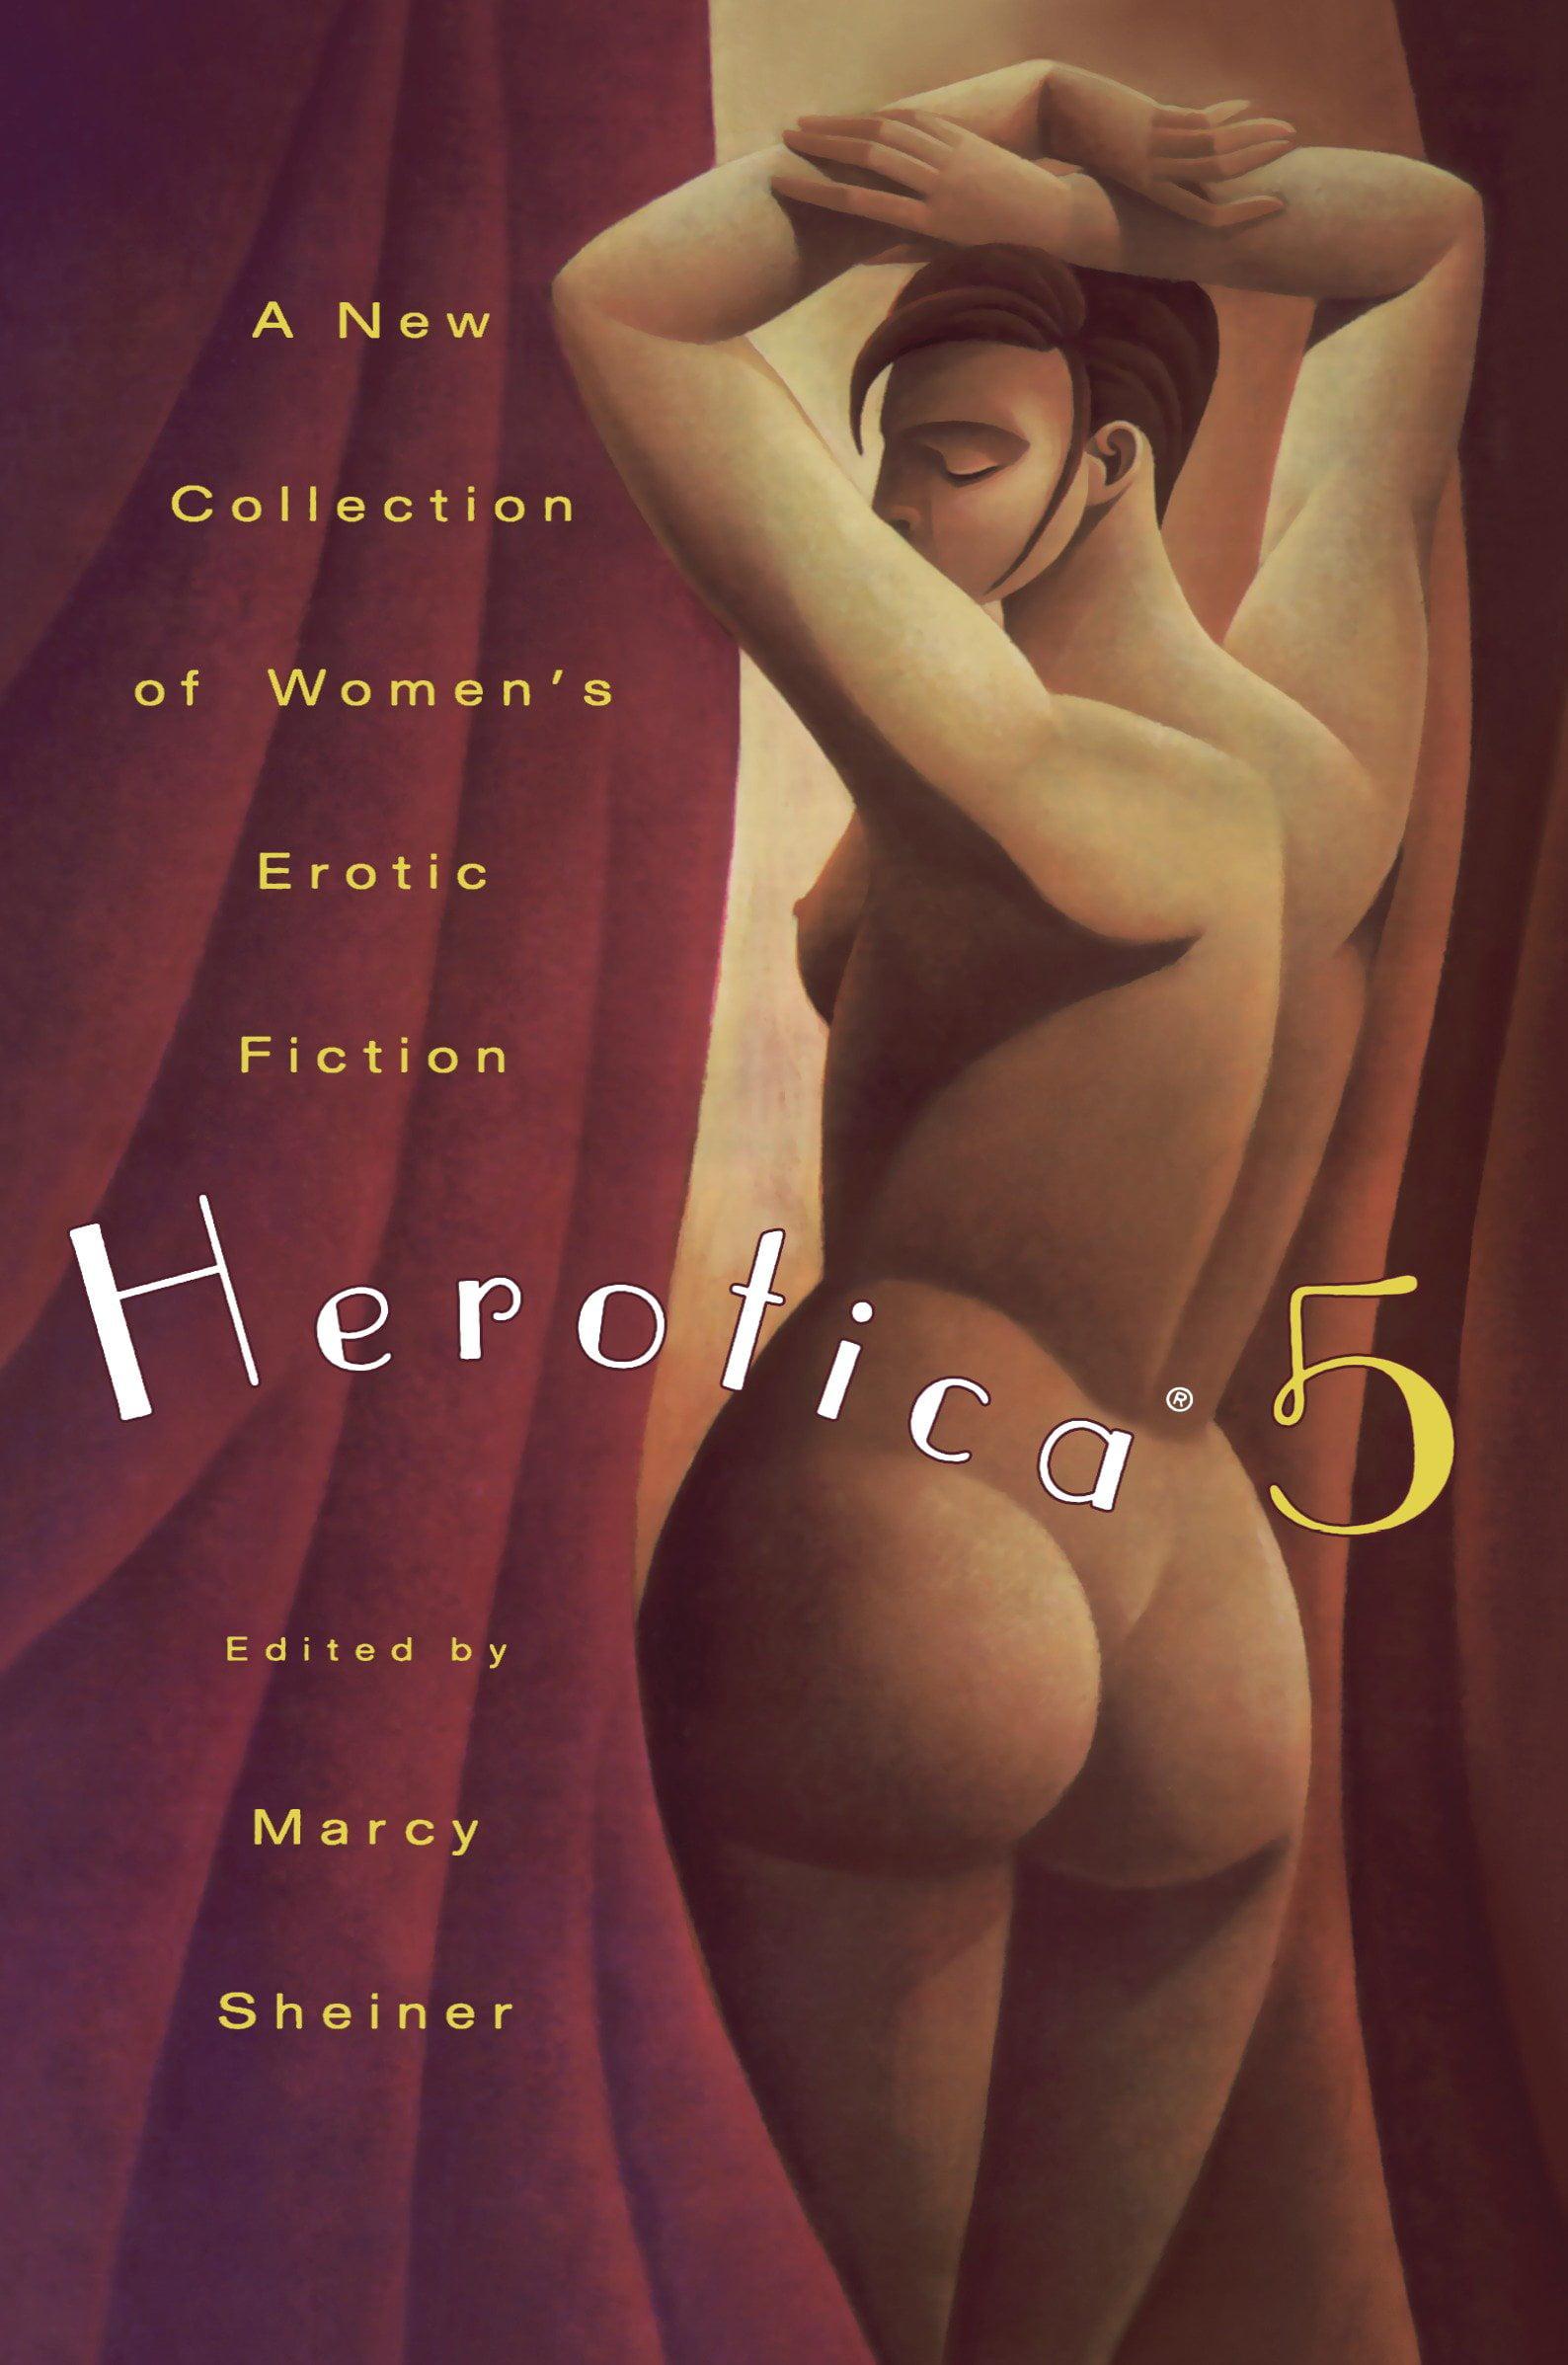 Free erotic romance books